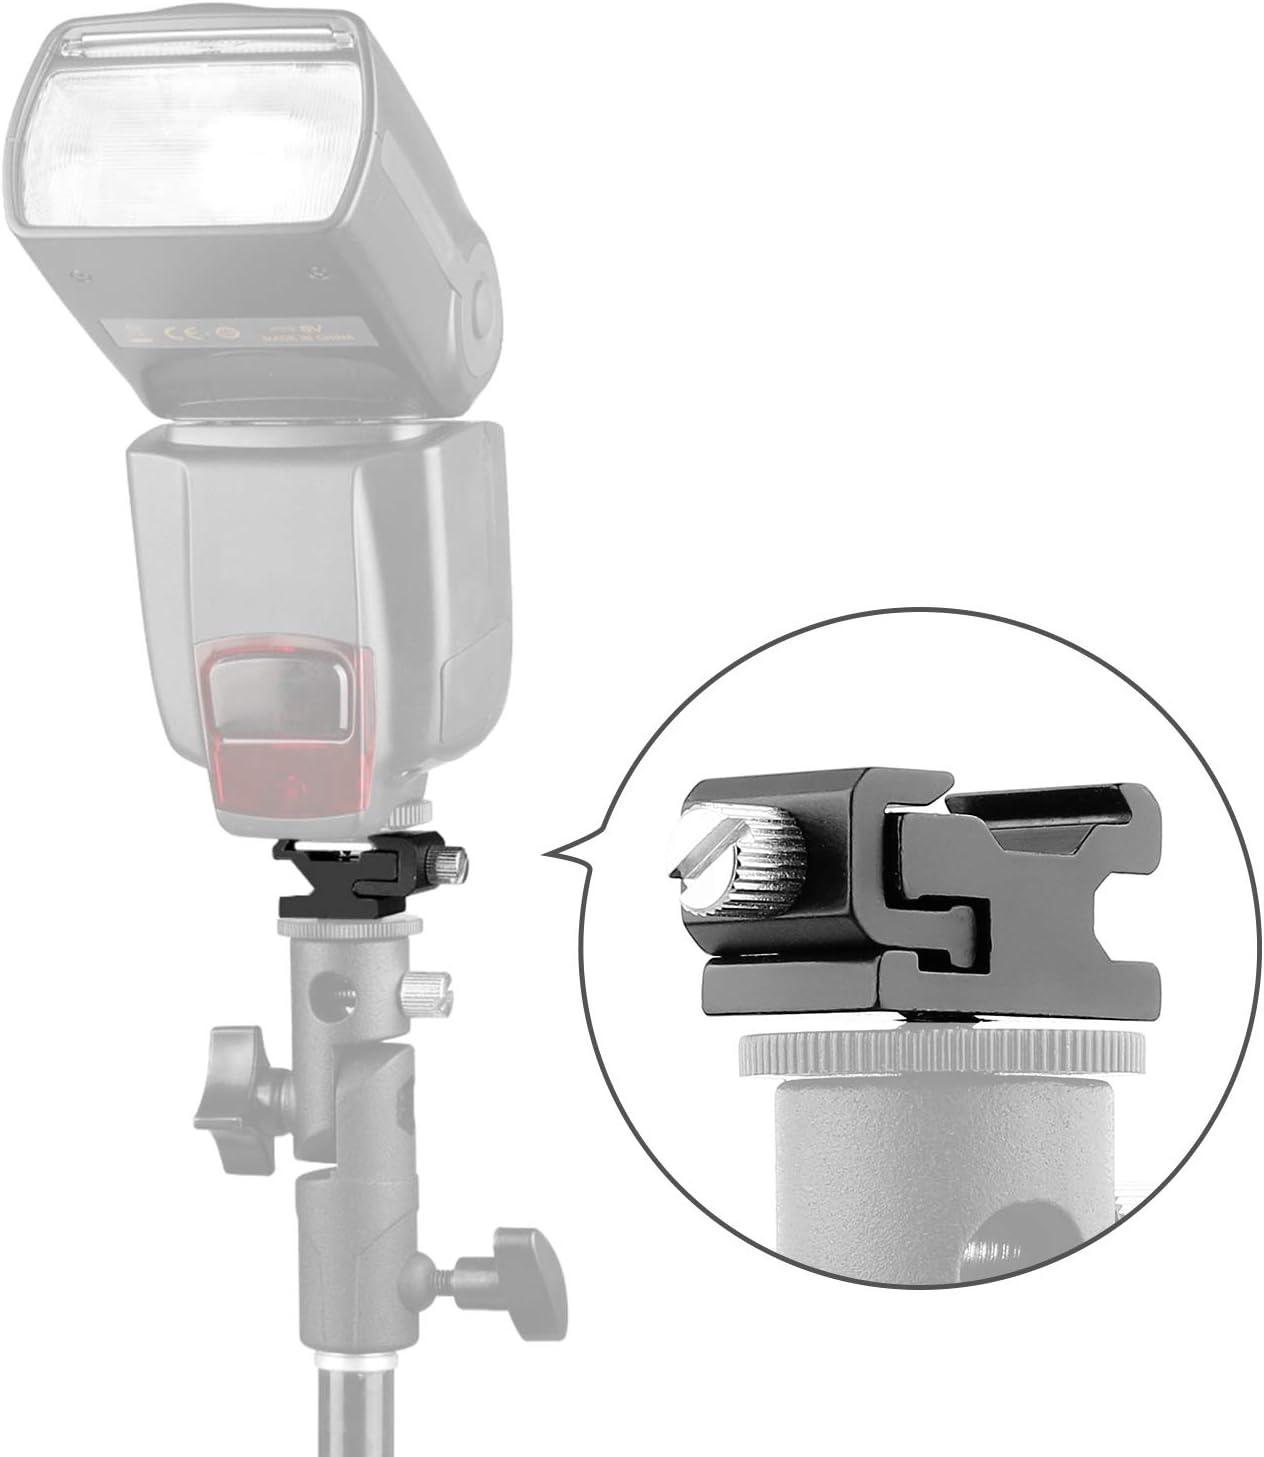 Ball Head Shoe Mount 1//4 Hot Shoe Mount Double Ballhead 1//4 Tripod Screw Multi-Function for LCD Monitors,Led Light,Microphone